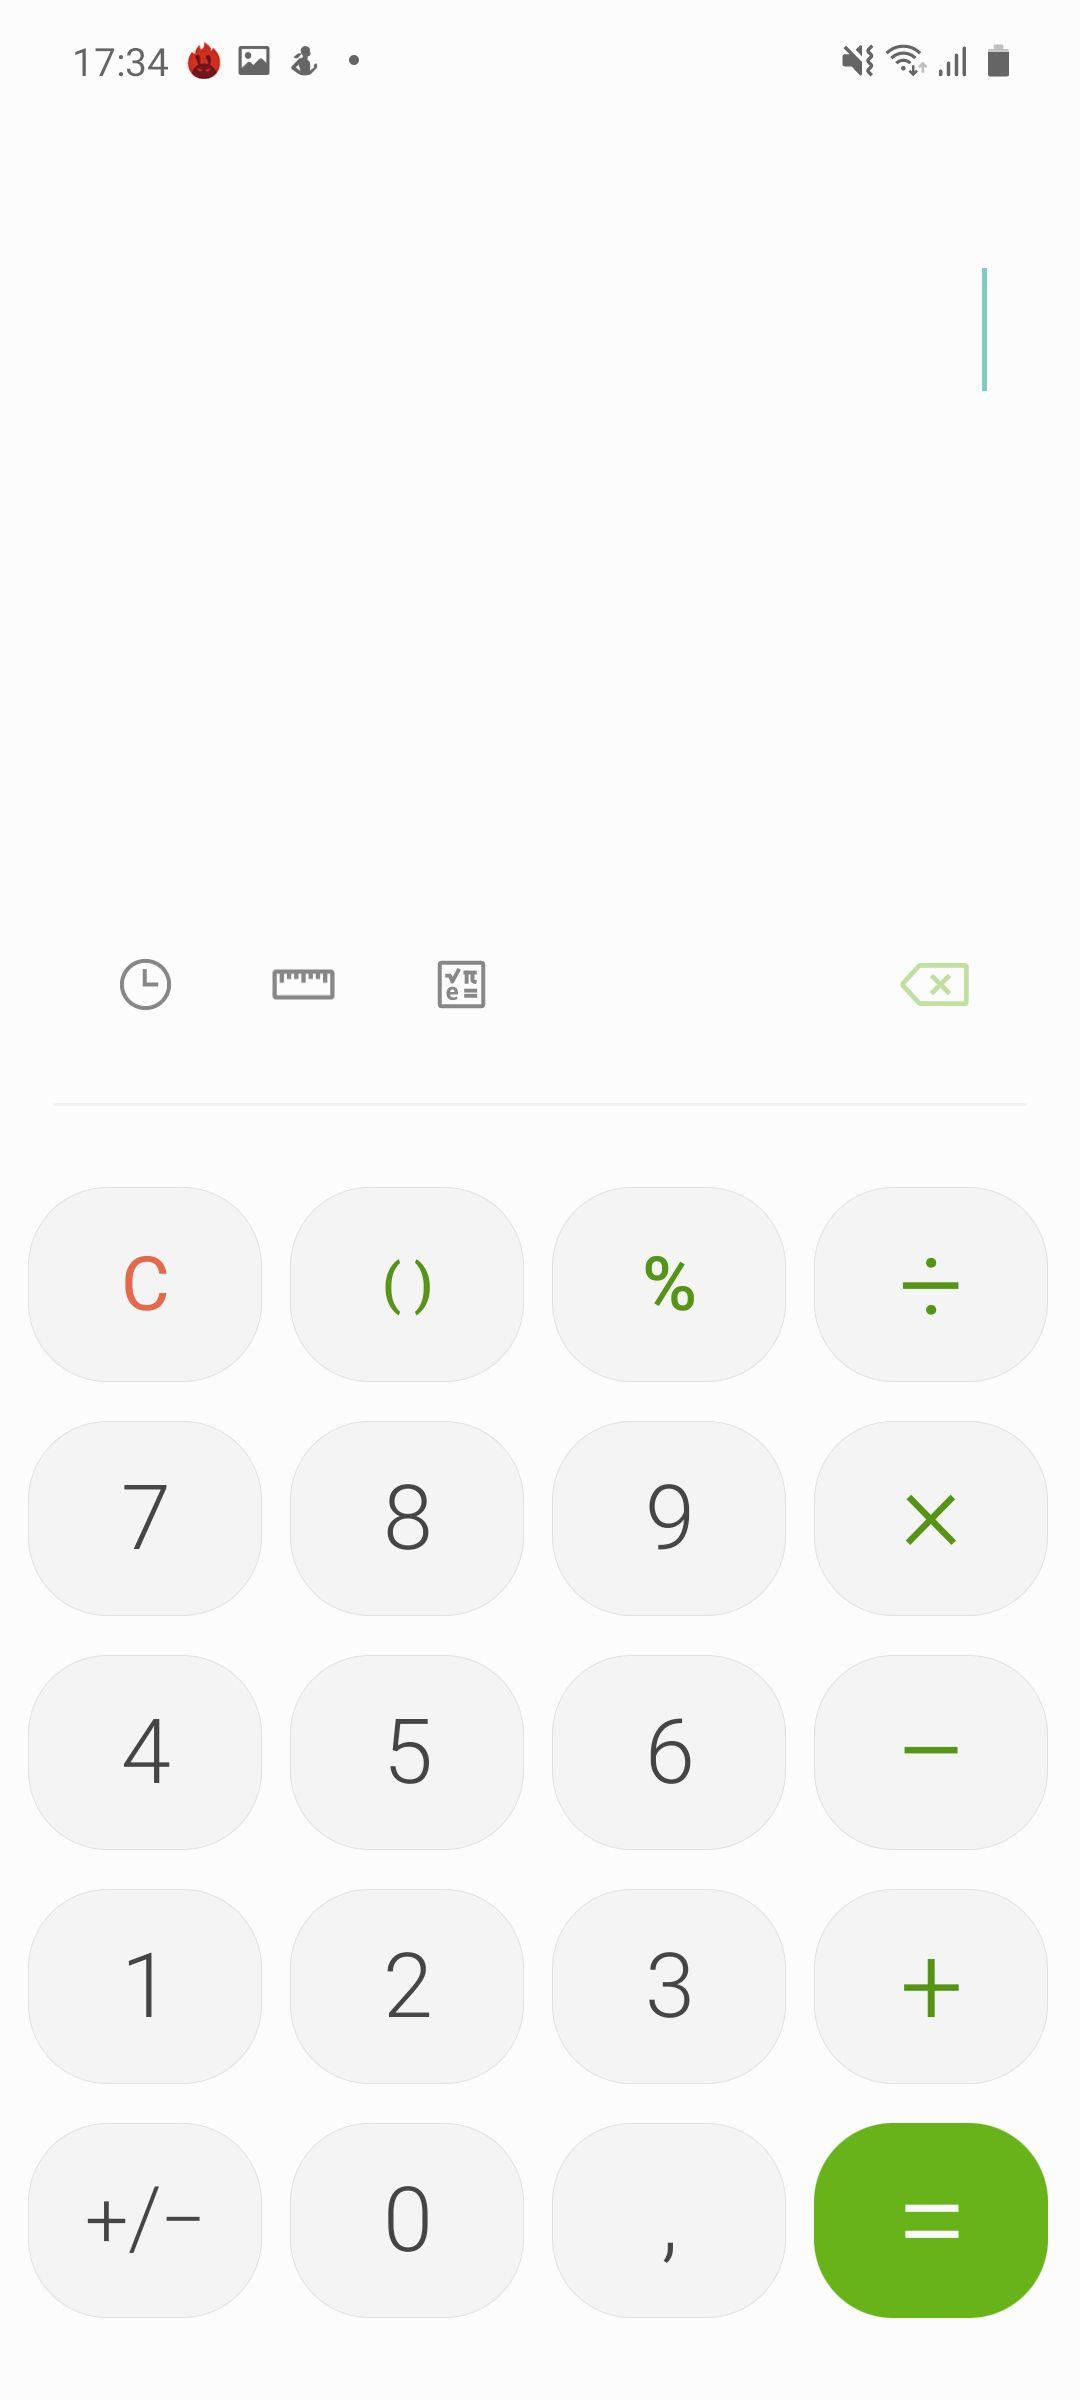 Обзор Samsung Galaxy A71: завышенный середнячок Samsung  - obzor_samsung_galaxy_a71_overprajsnutyj_serednak_picture26_15